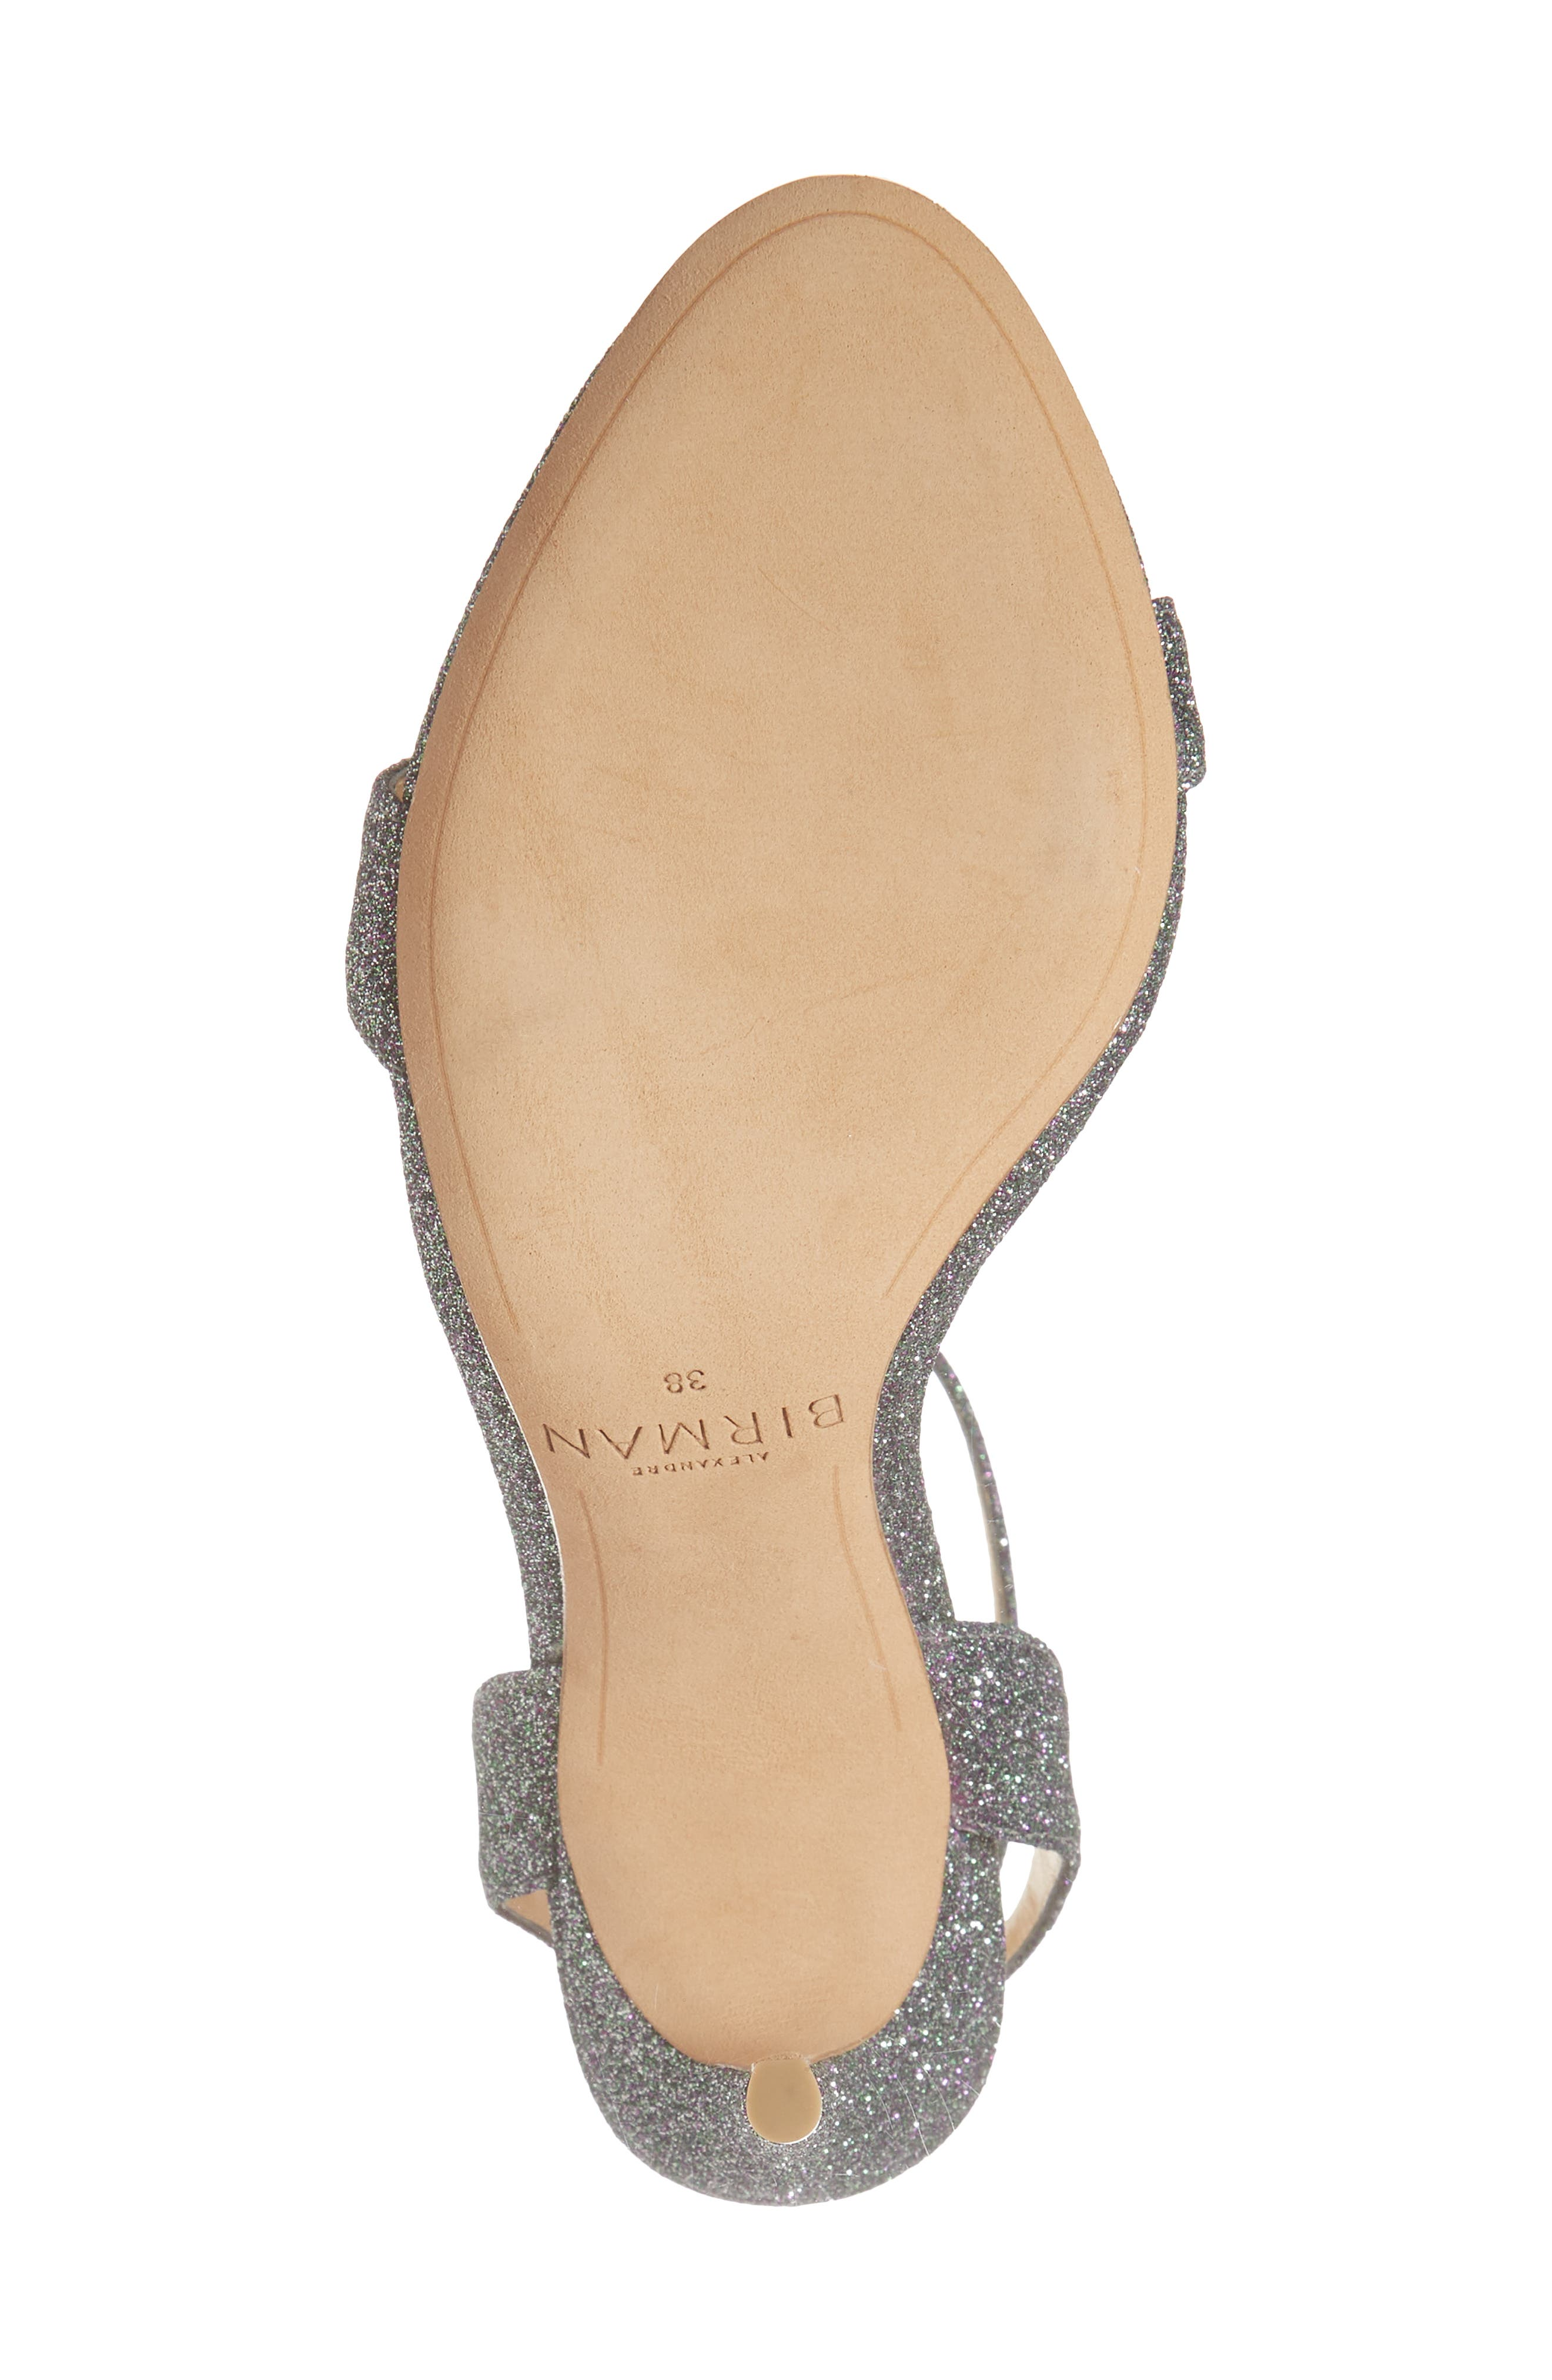 Santine Ankle Strap Sandal,                             Alternate thumbnail 6, color,                             SILVER